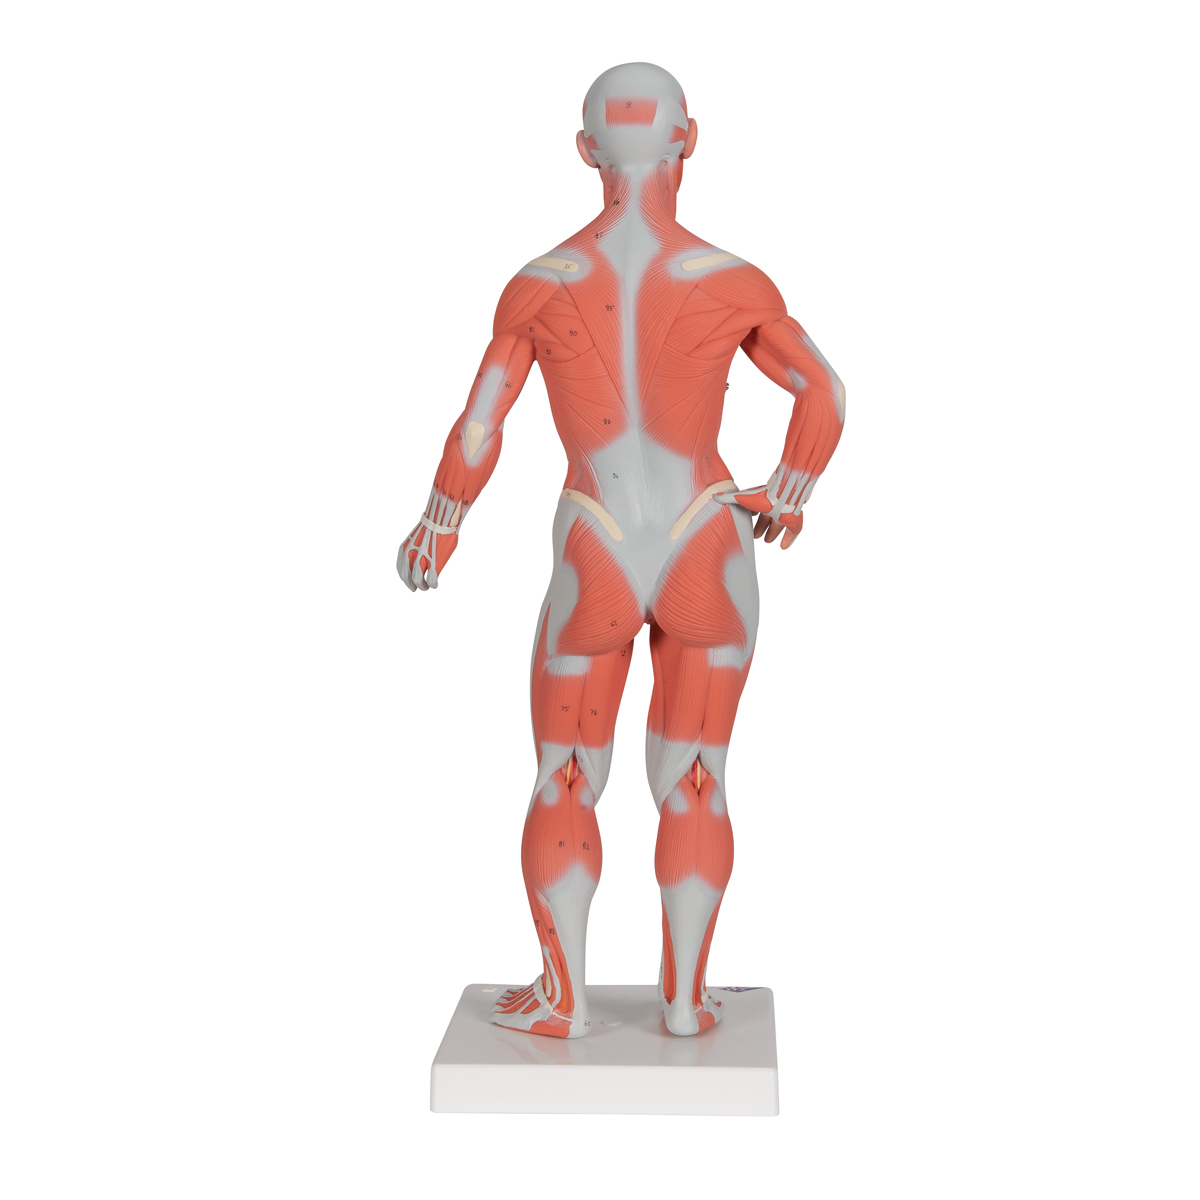 Live anatomy model